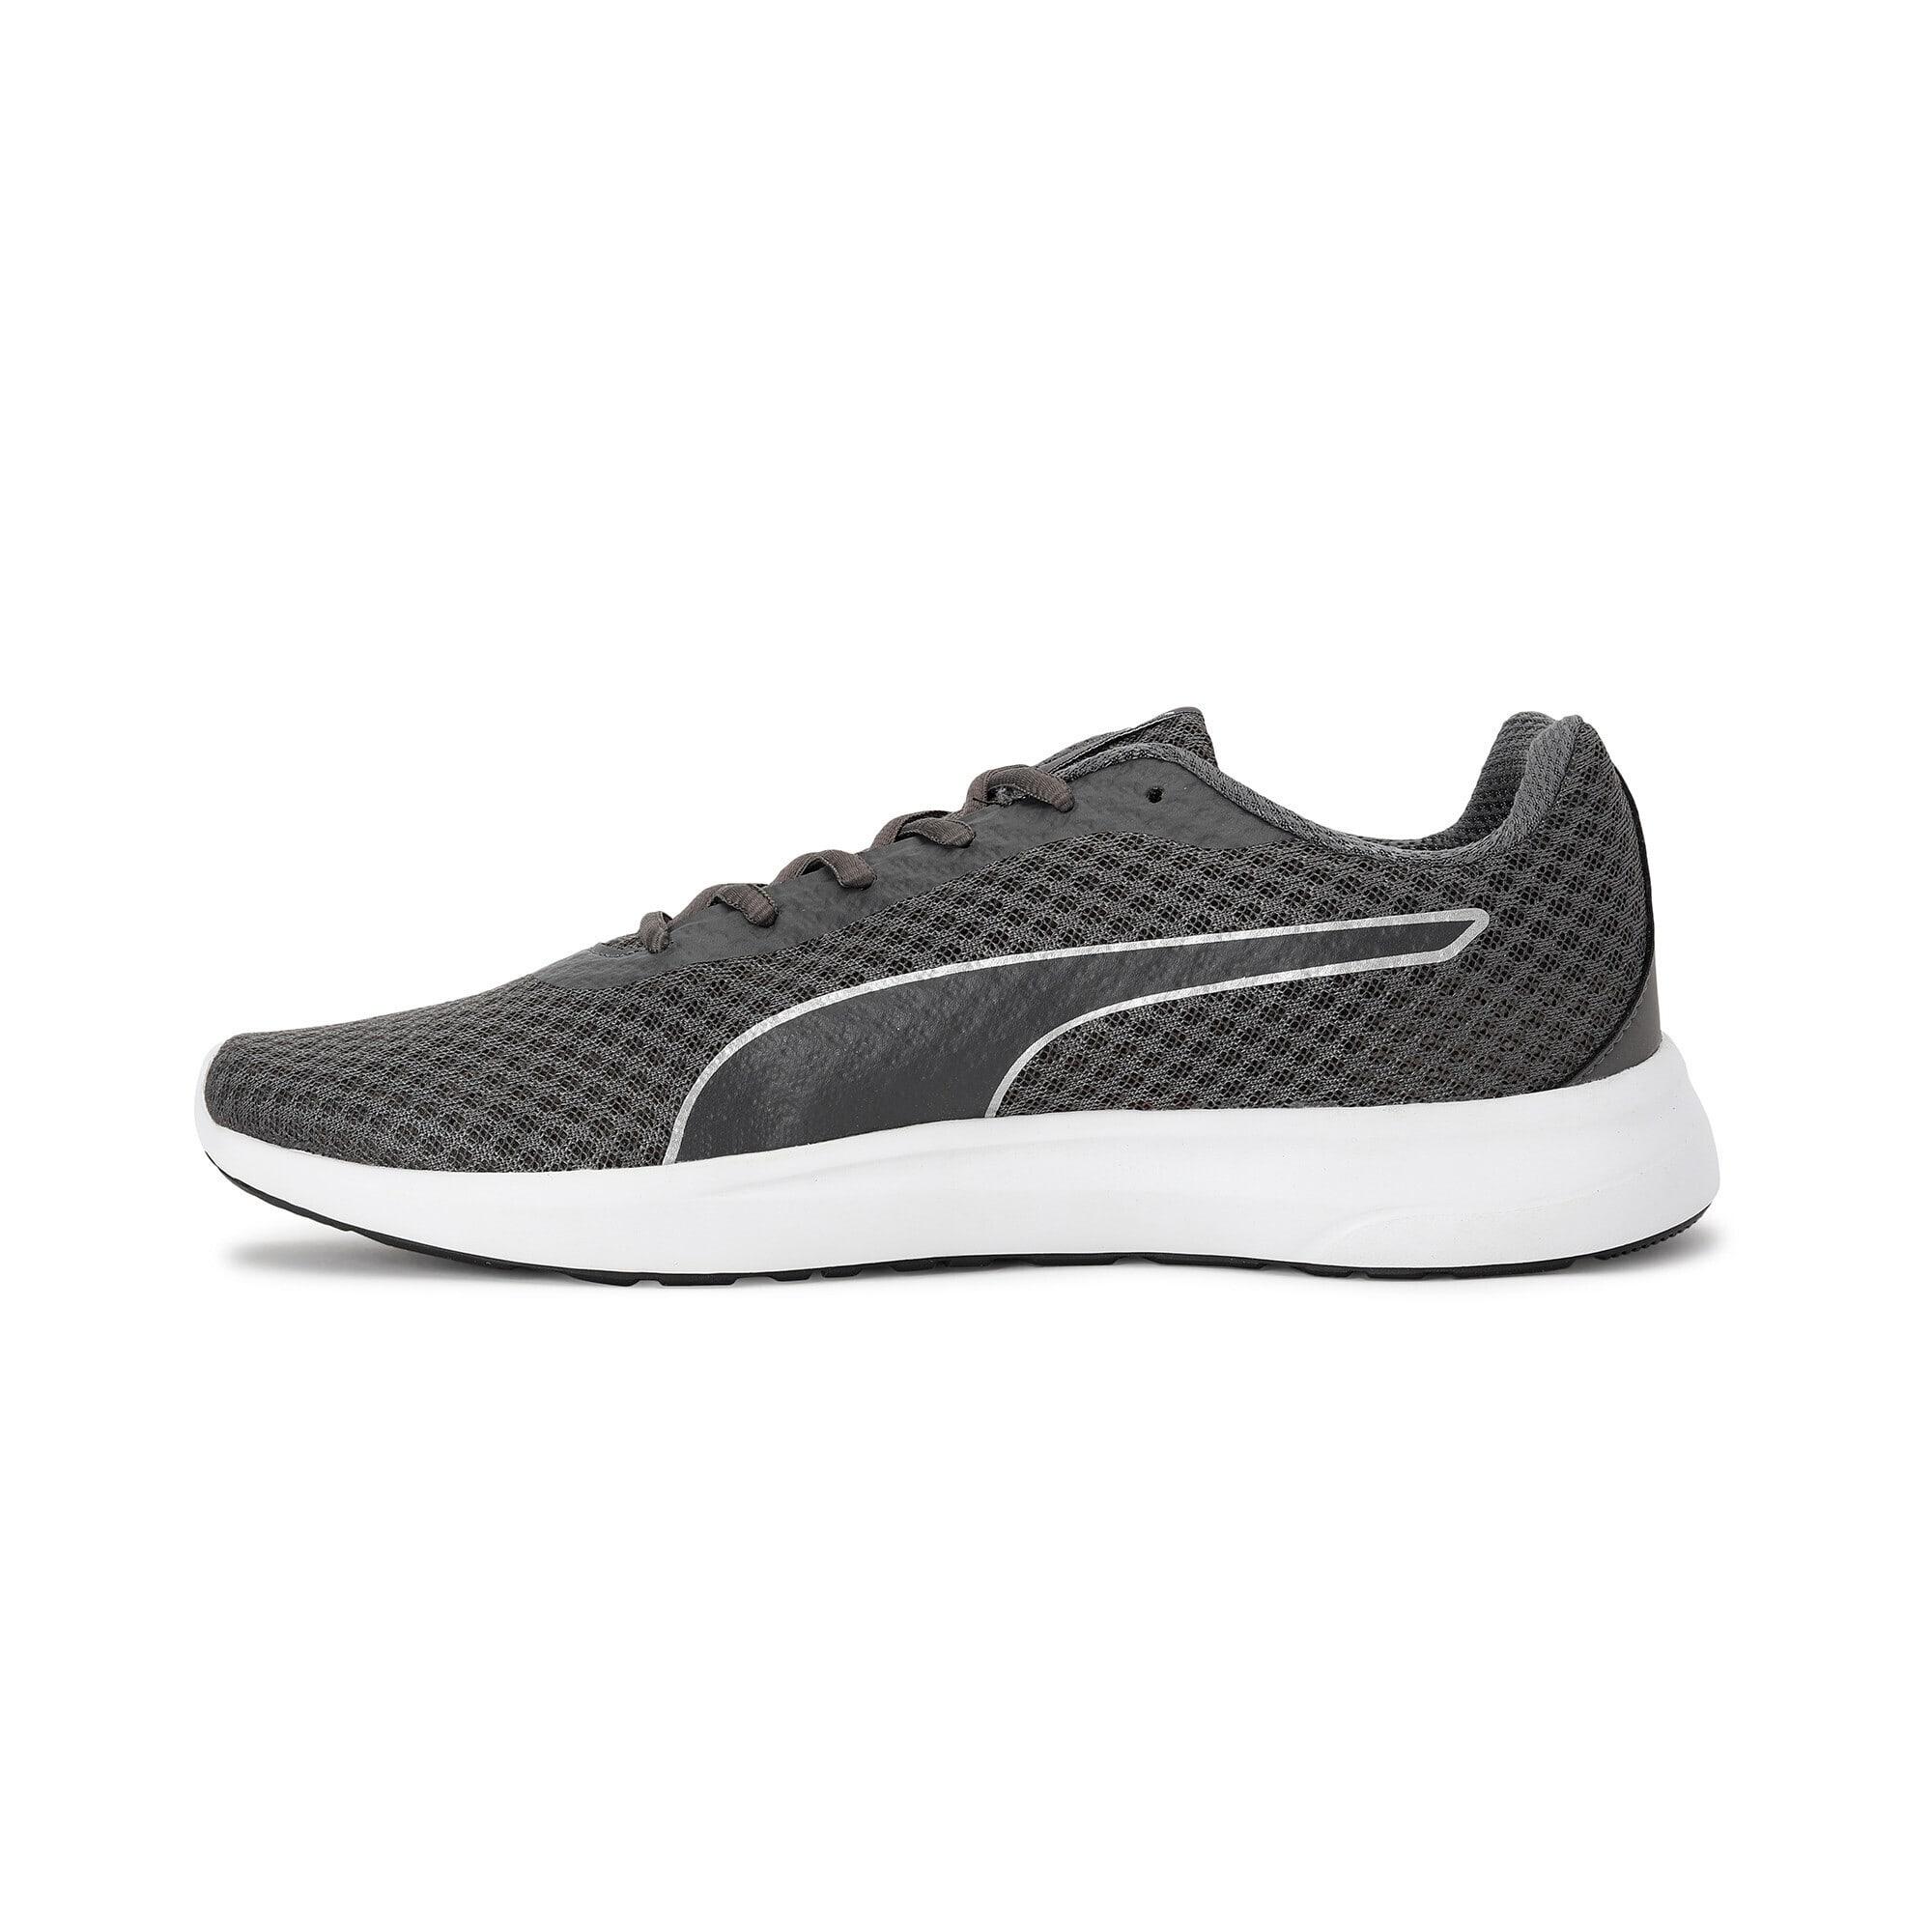 Thumbnail 1 of Propel EL IDP Men's Sportstyle Shoes, Asphalt-Silver-White-Black, medium-IND